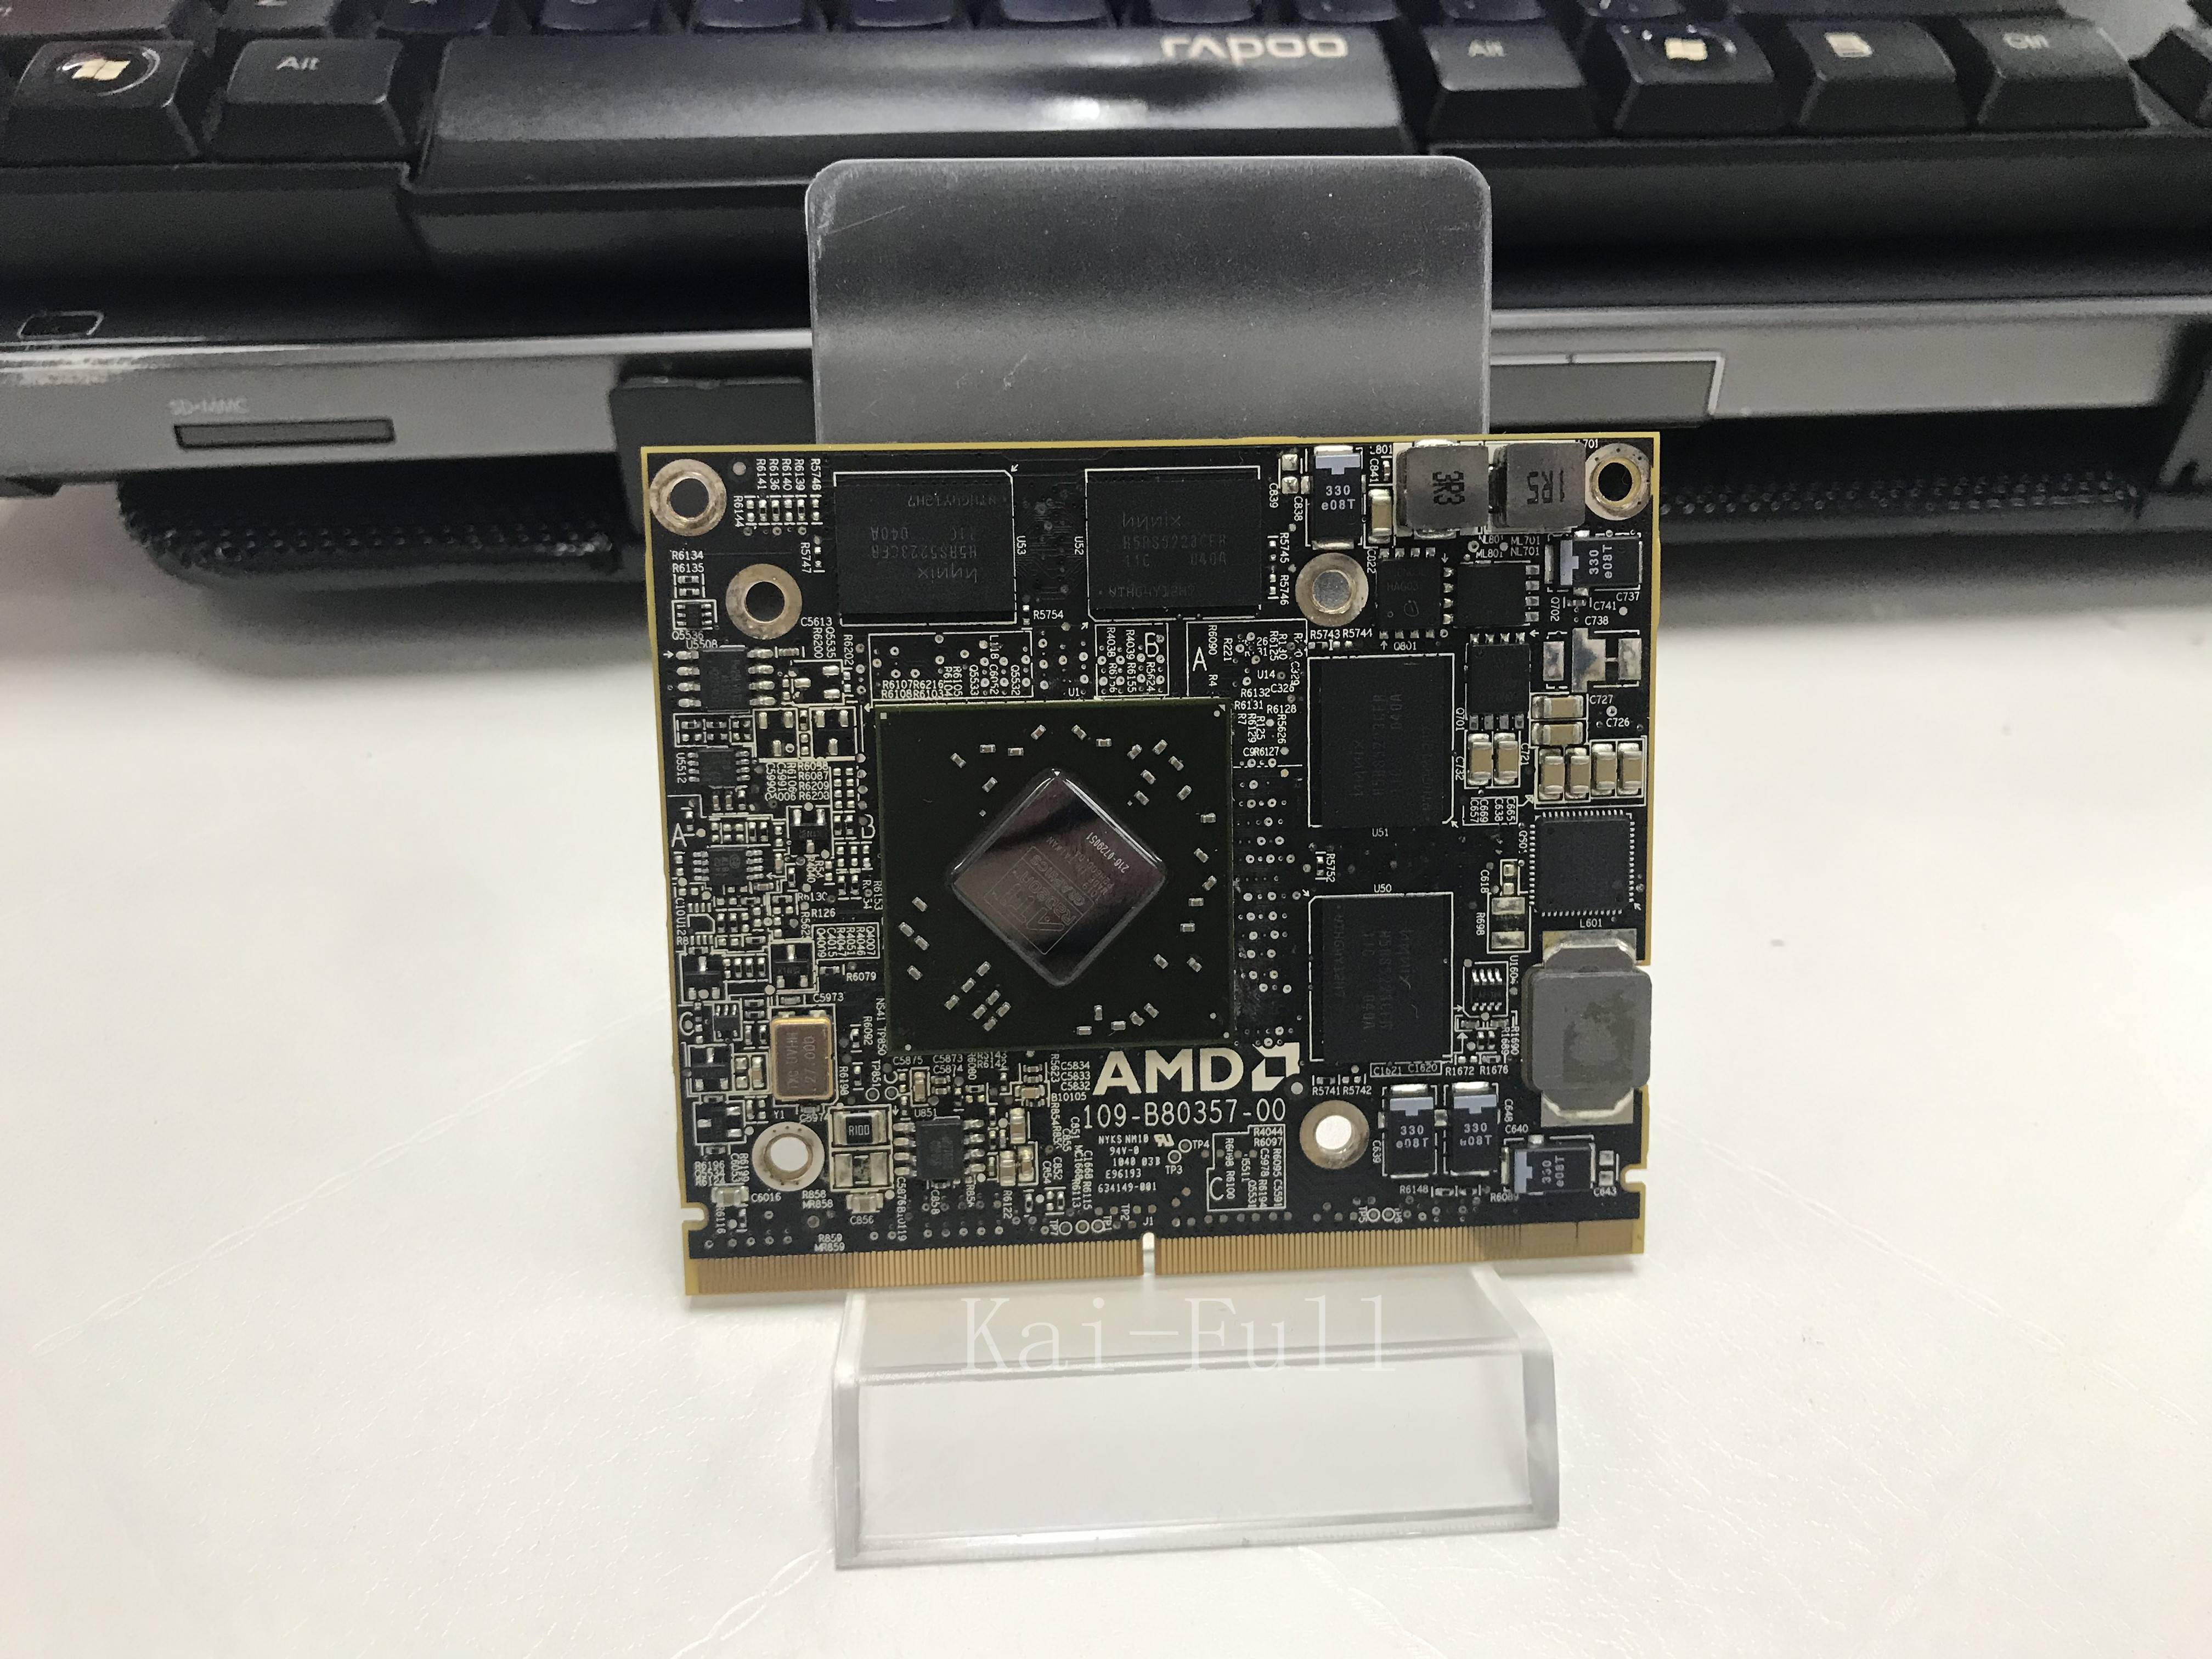 Original HD4670 256MB 109-B80357-00 For iMac 21.5 A1311 HD 4670 Vga Video Graphics Card